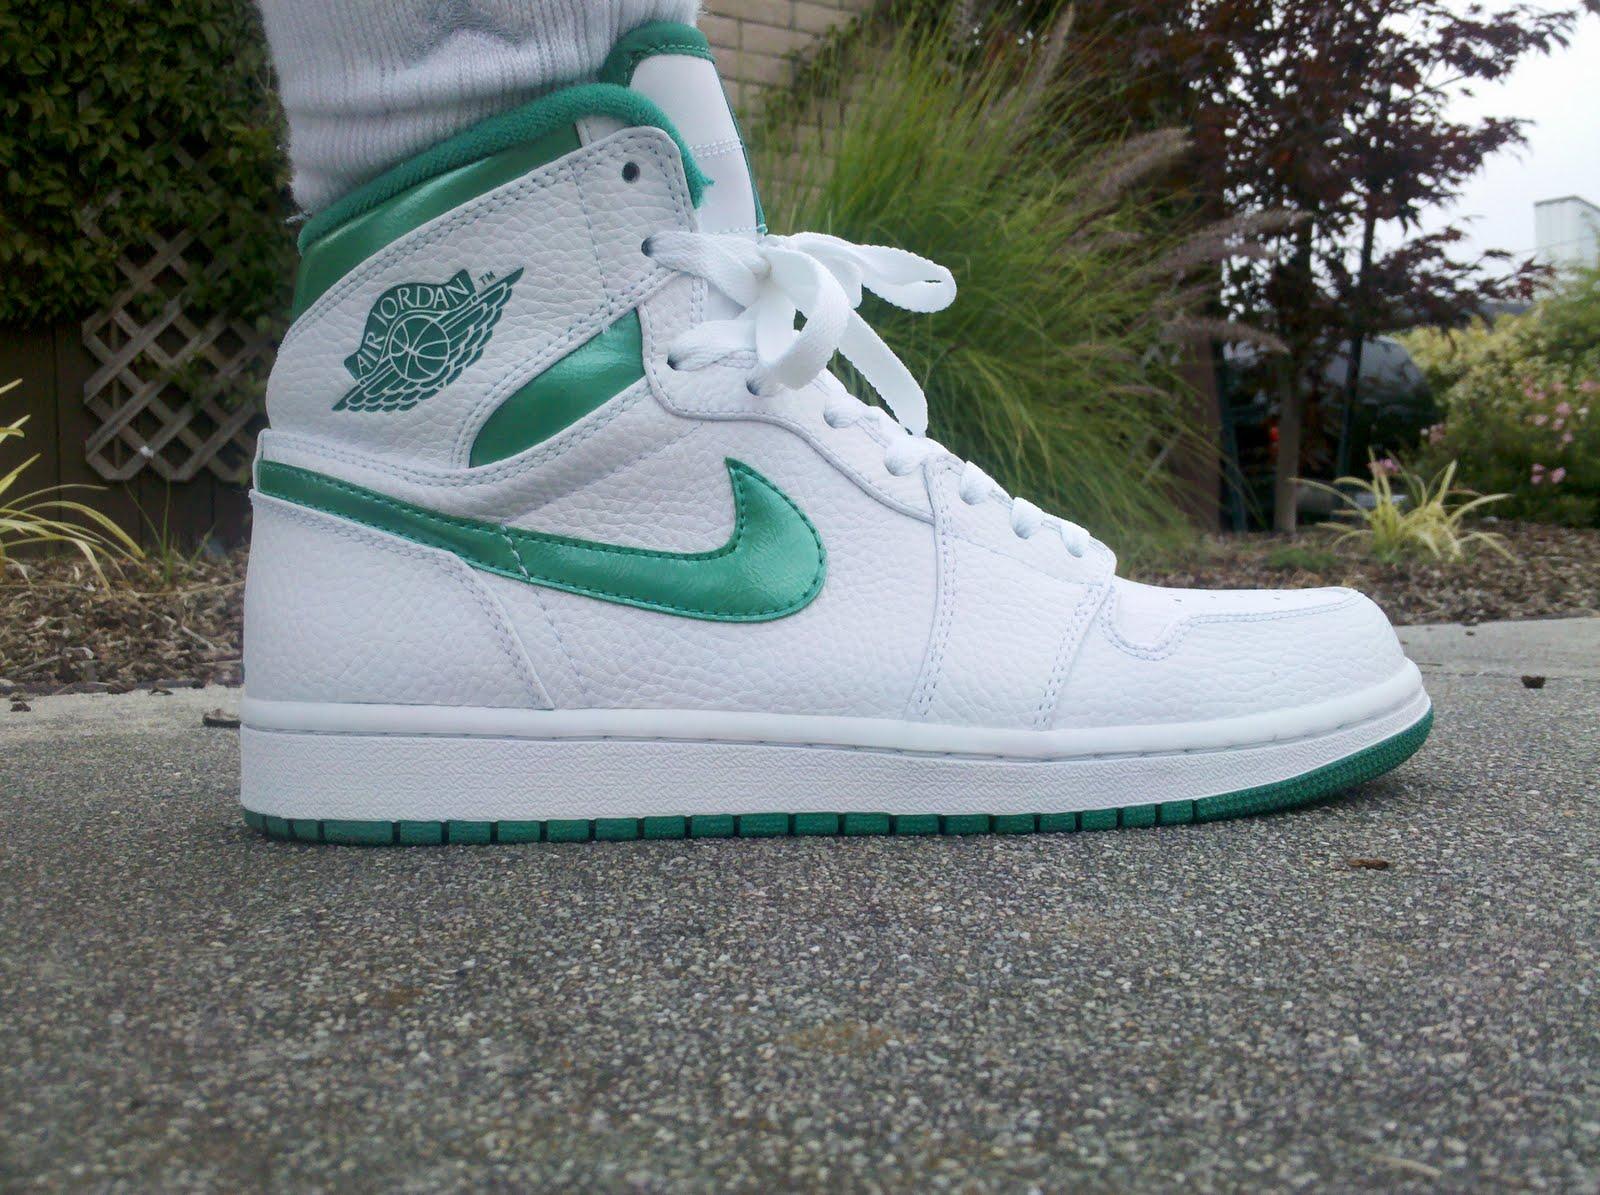 hot sale online 0b56f 1d9d3 KickItFresh Sneaker Photo Blog: SNEAKER REVIEW - AIR JORDAN ...